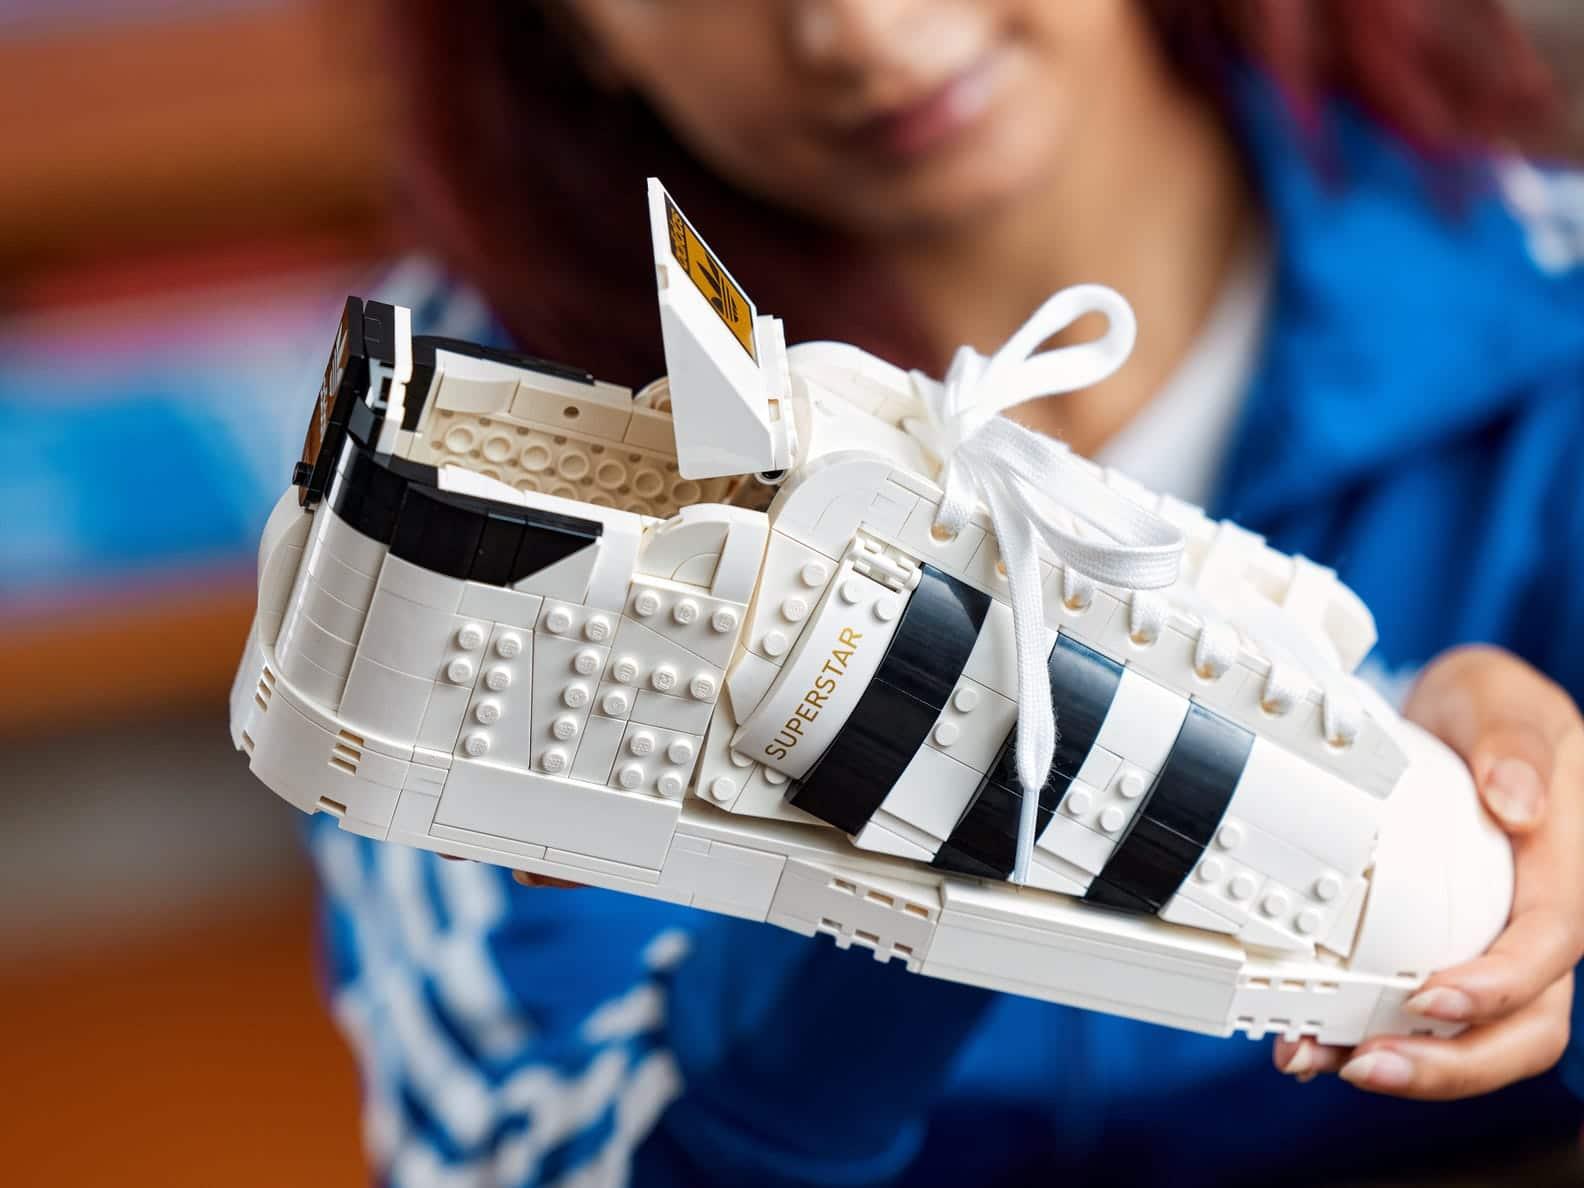 LEGO releases a buildable model of Adidas Originals Superstar 17